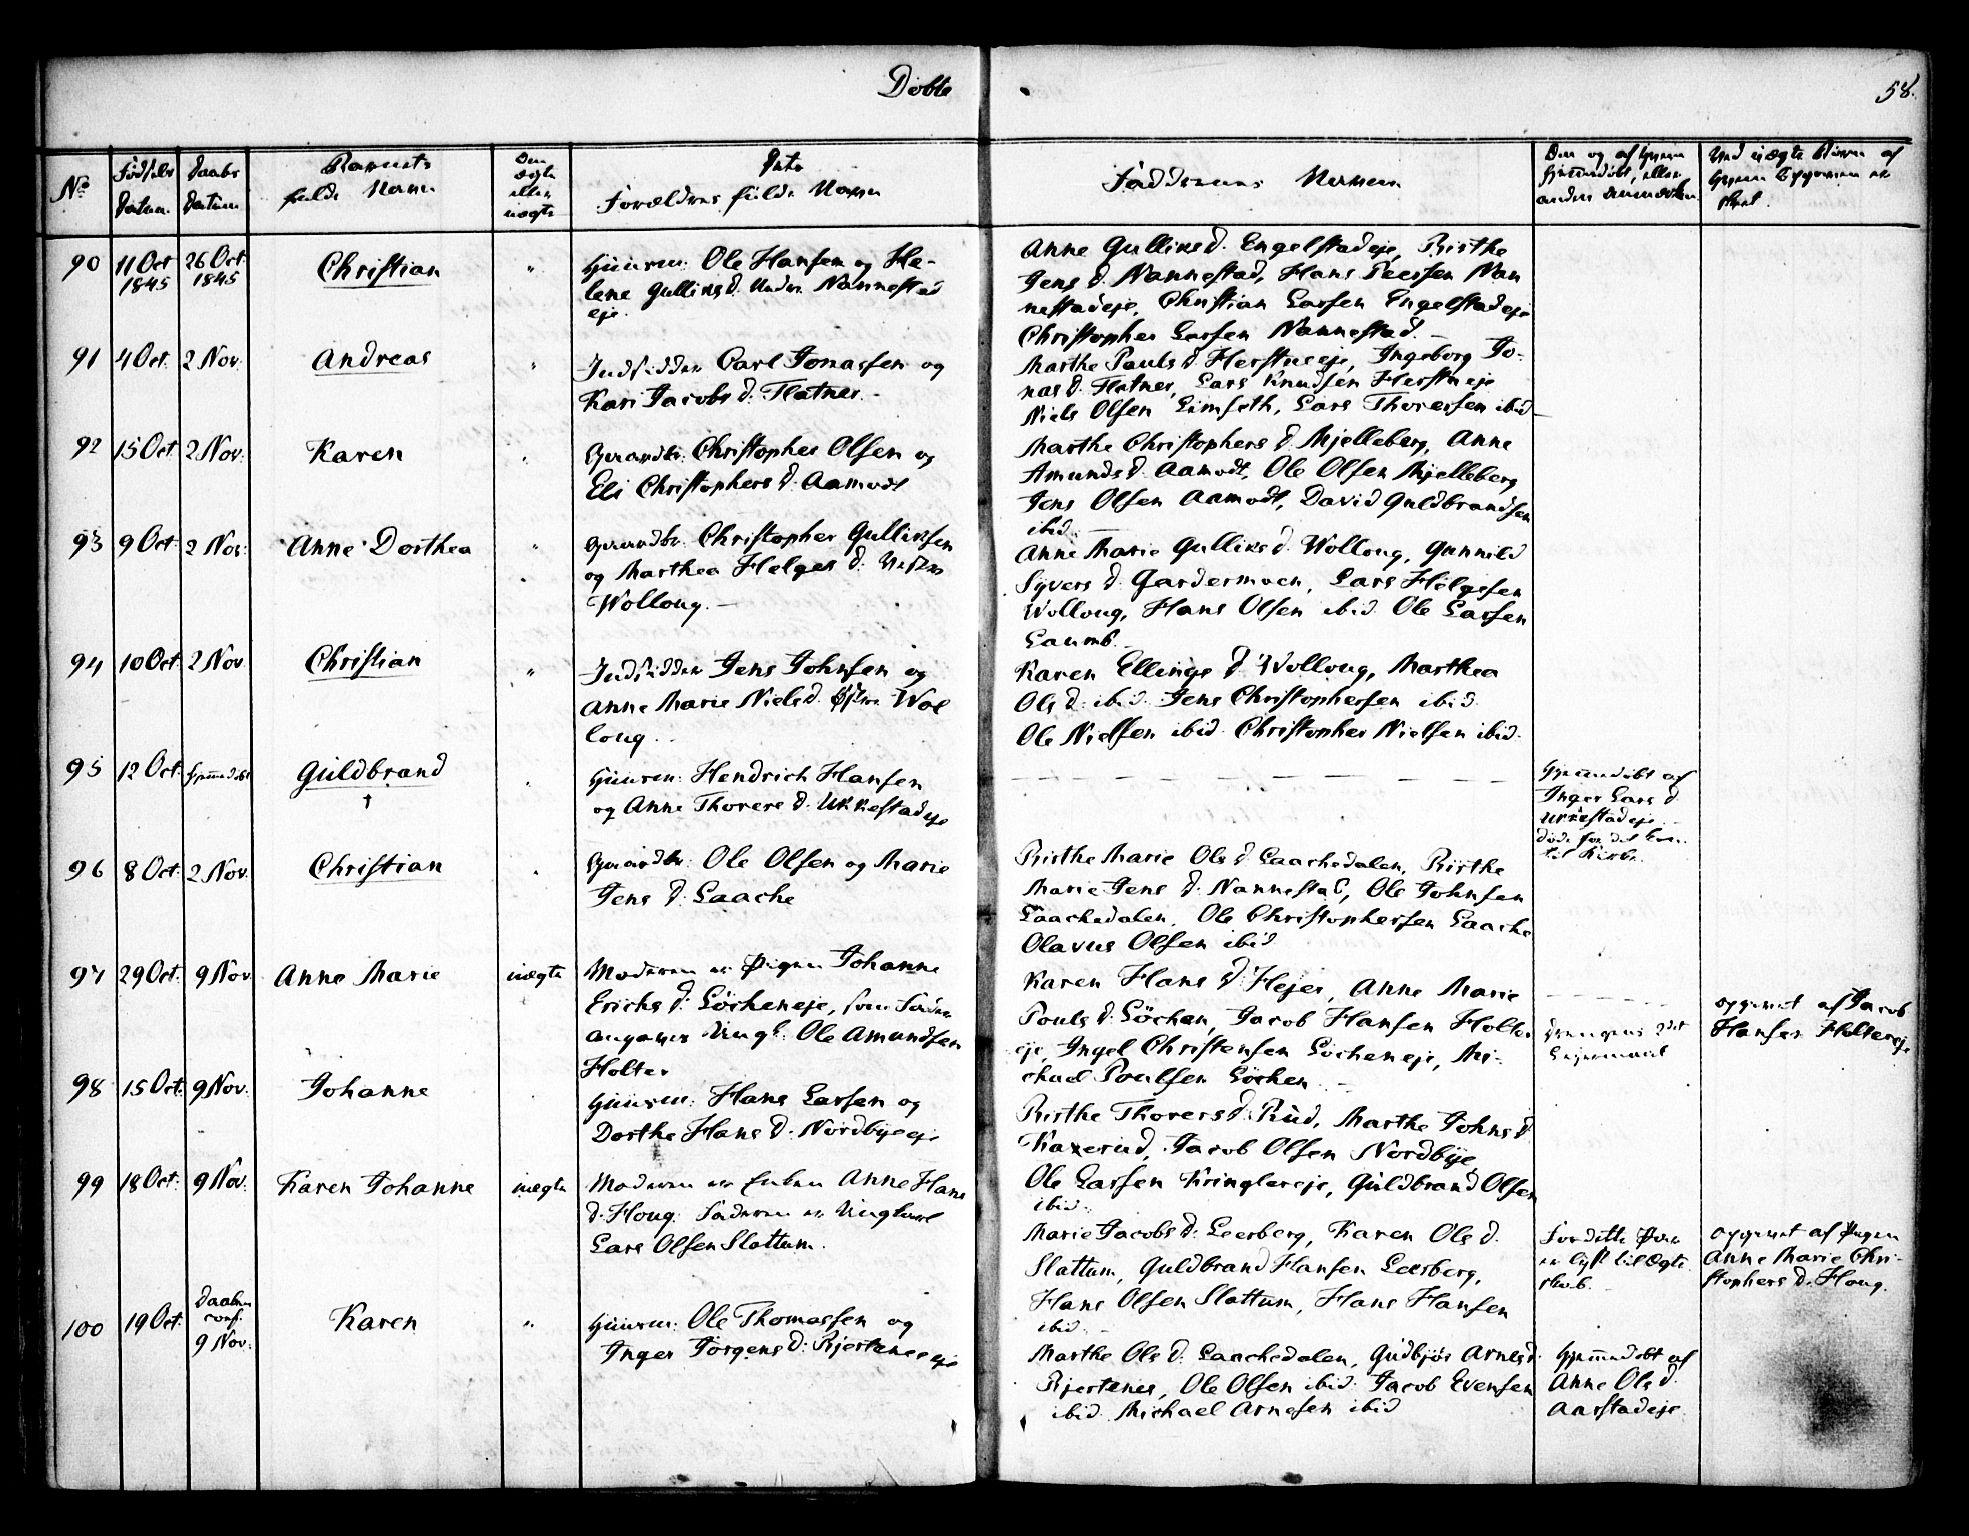 SAO, Nannestad prestekontor Kirkebøker, F/Fa/L0010: Parish register (official) no. I 10, 1840-1850, p. 58